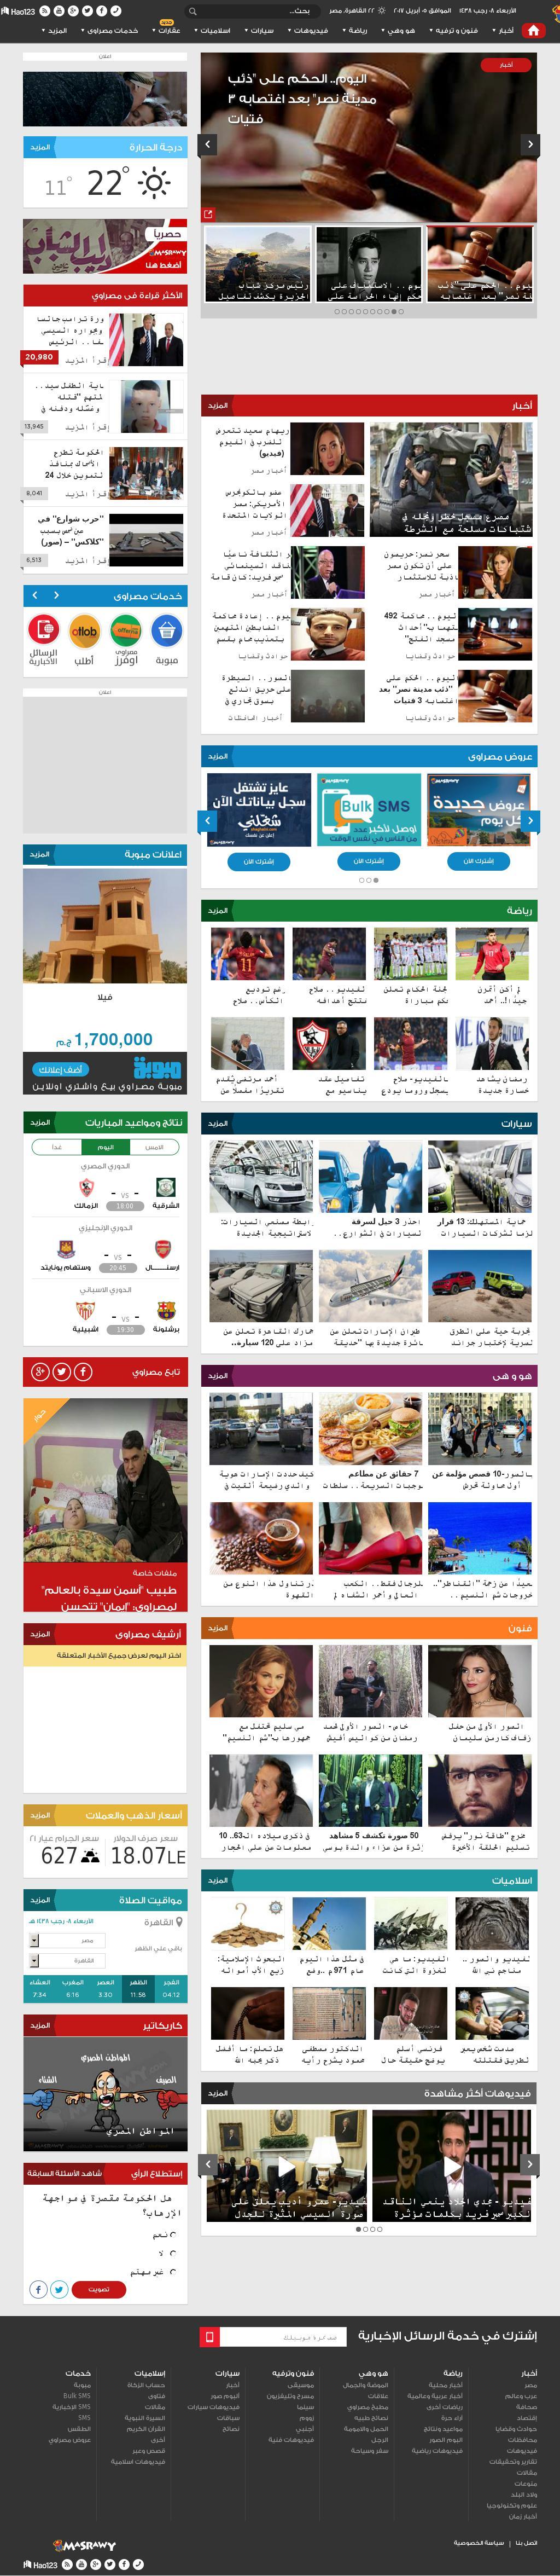 Masrawy at Wednesday April 5, 2017, 5:10 a.m. UTC